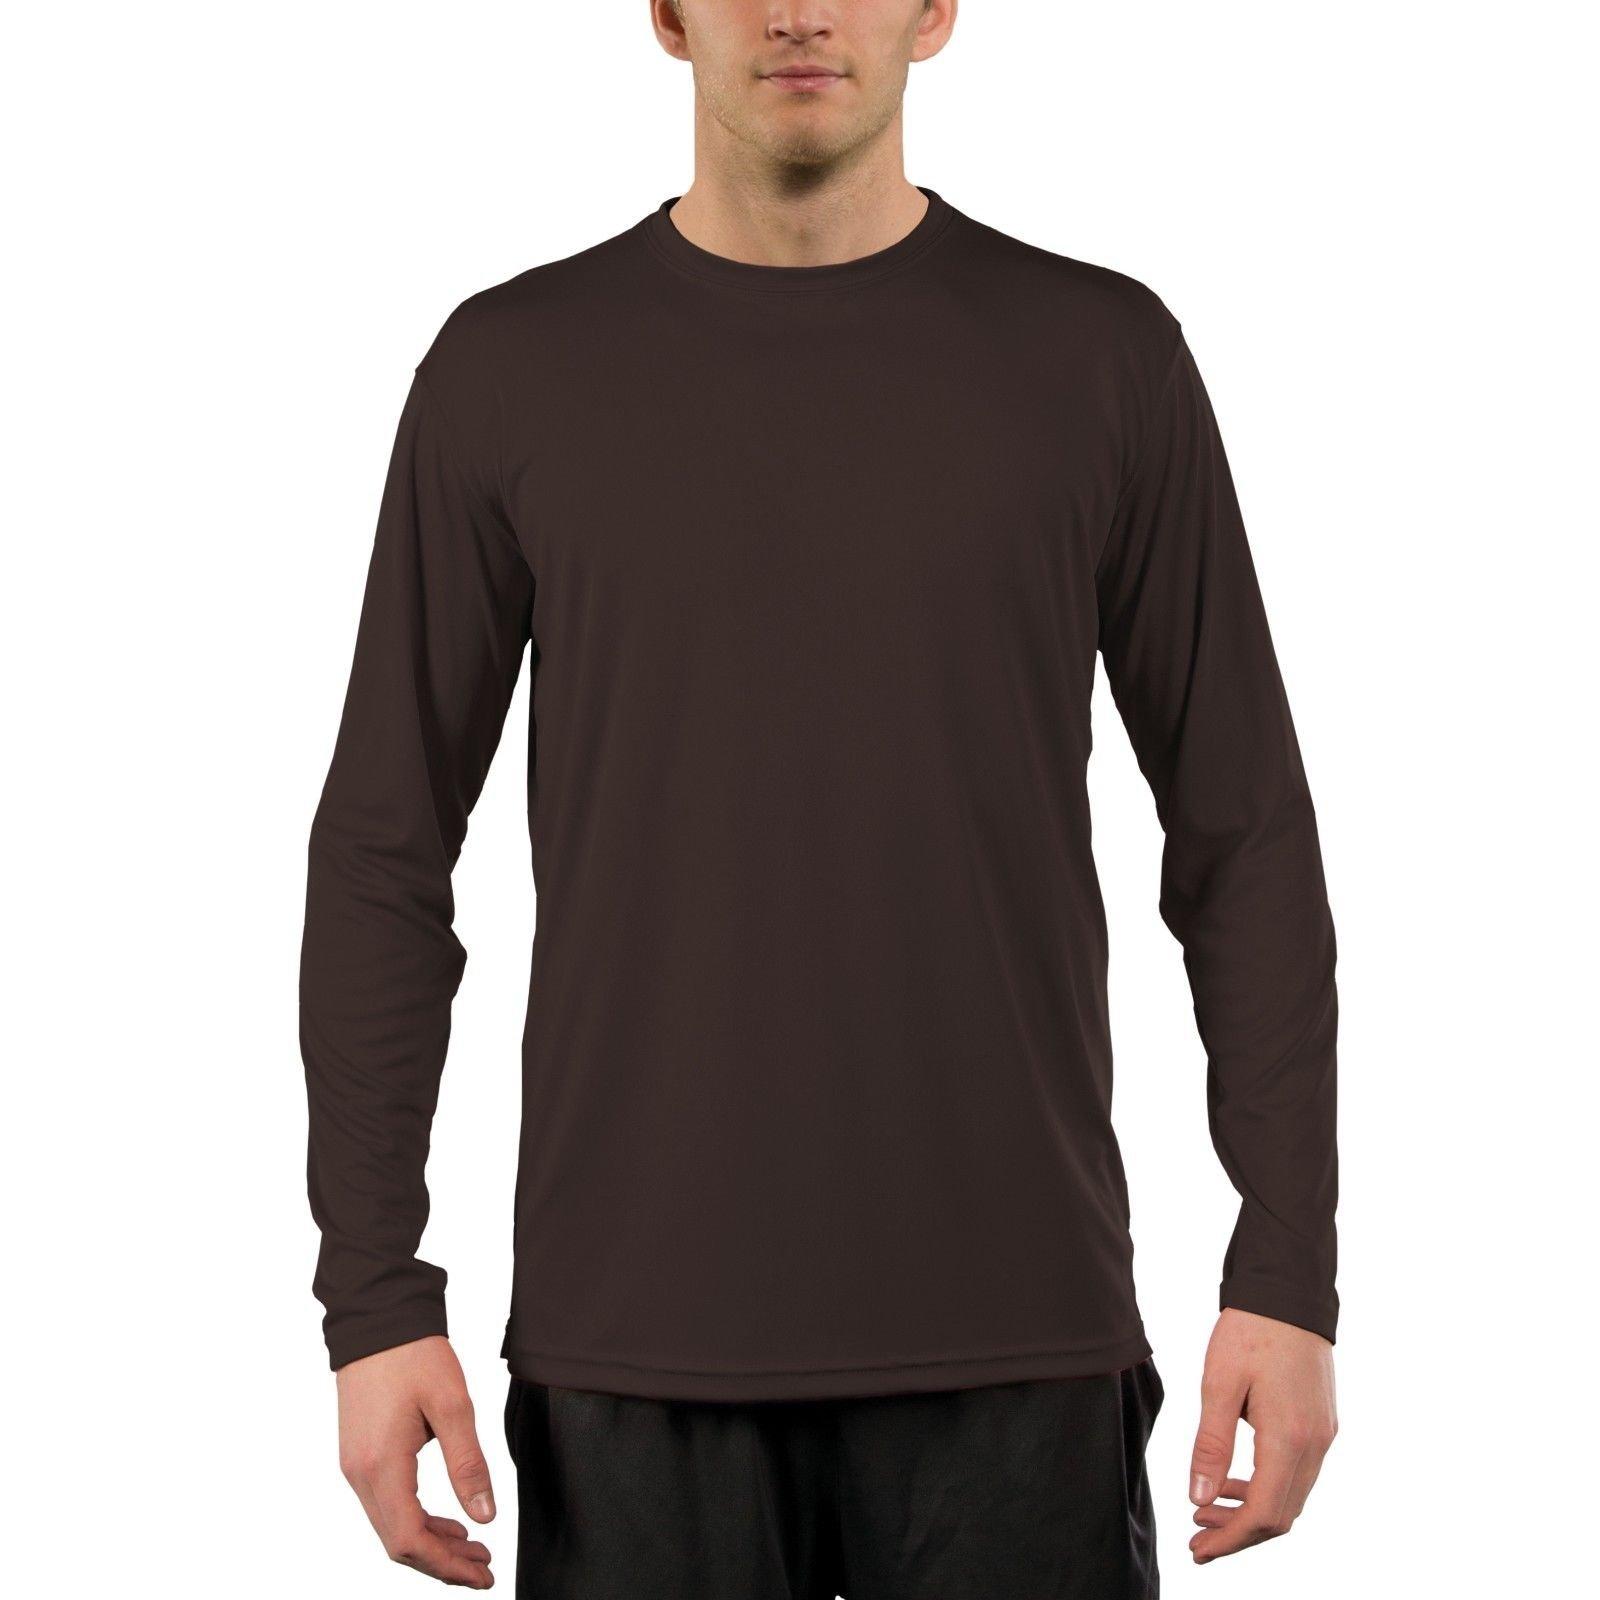 sleeve sun protection shirts best shirt 2017